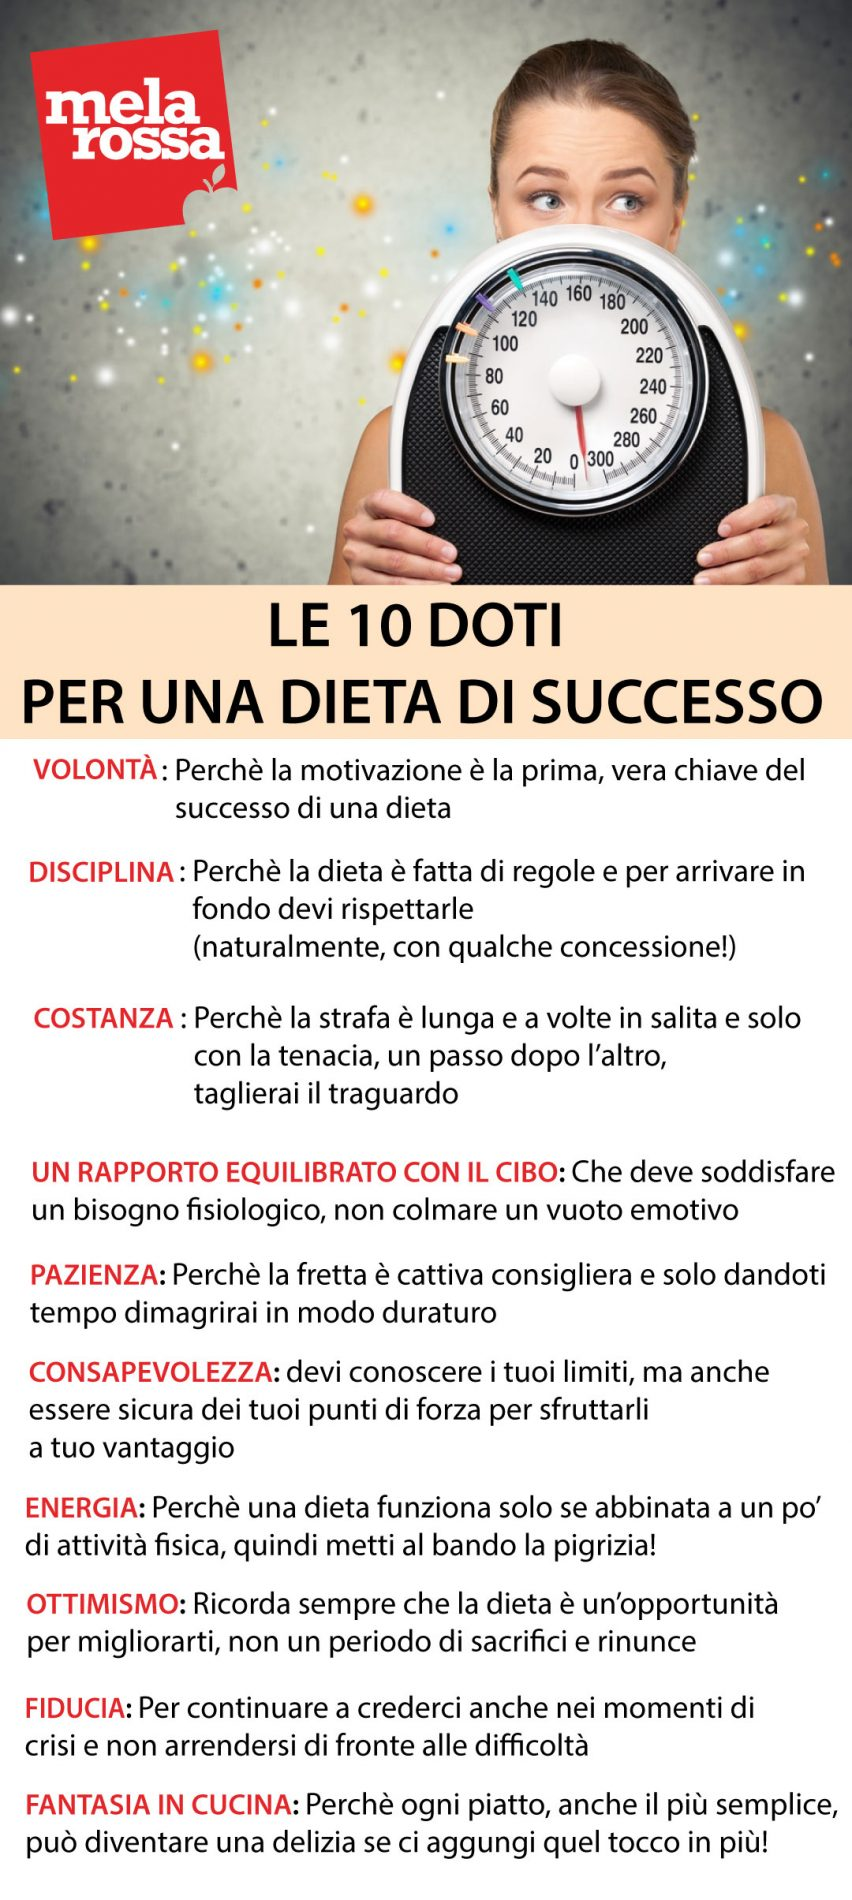 10 doti dieta di successo